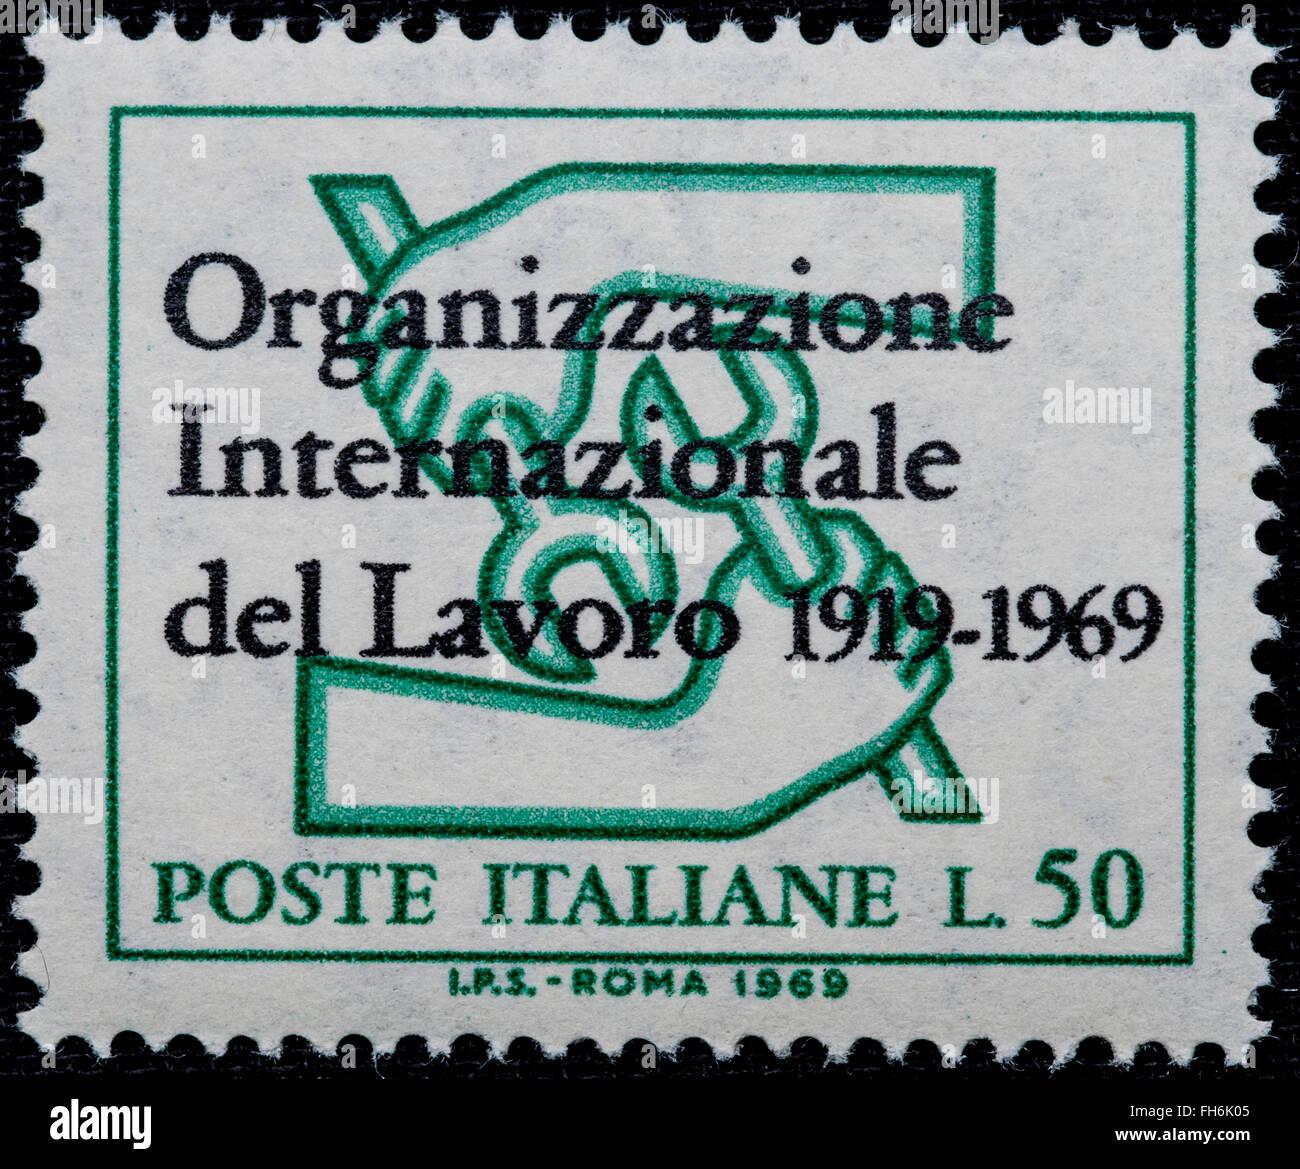 1969 - Italian mint stamp issued to commemorate International Work Organization Lire 50 Stock Photo